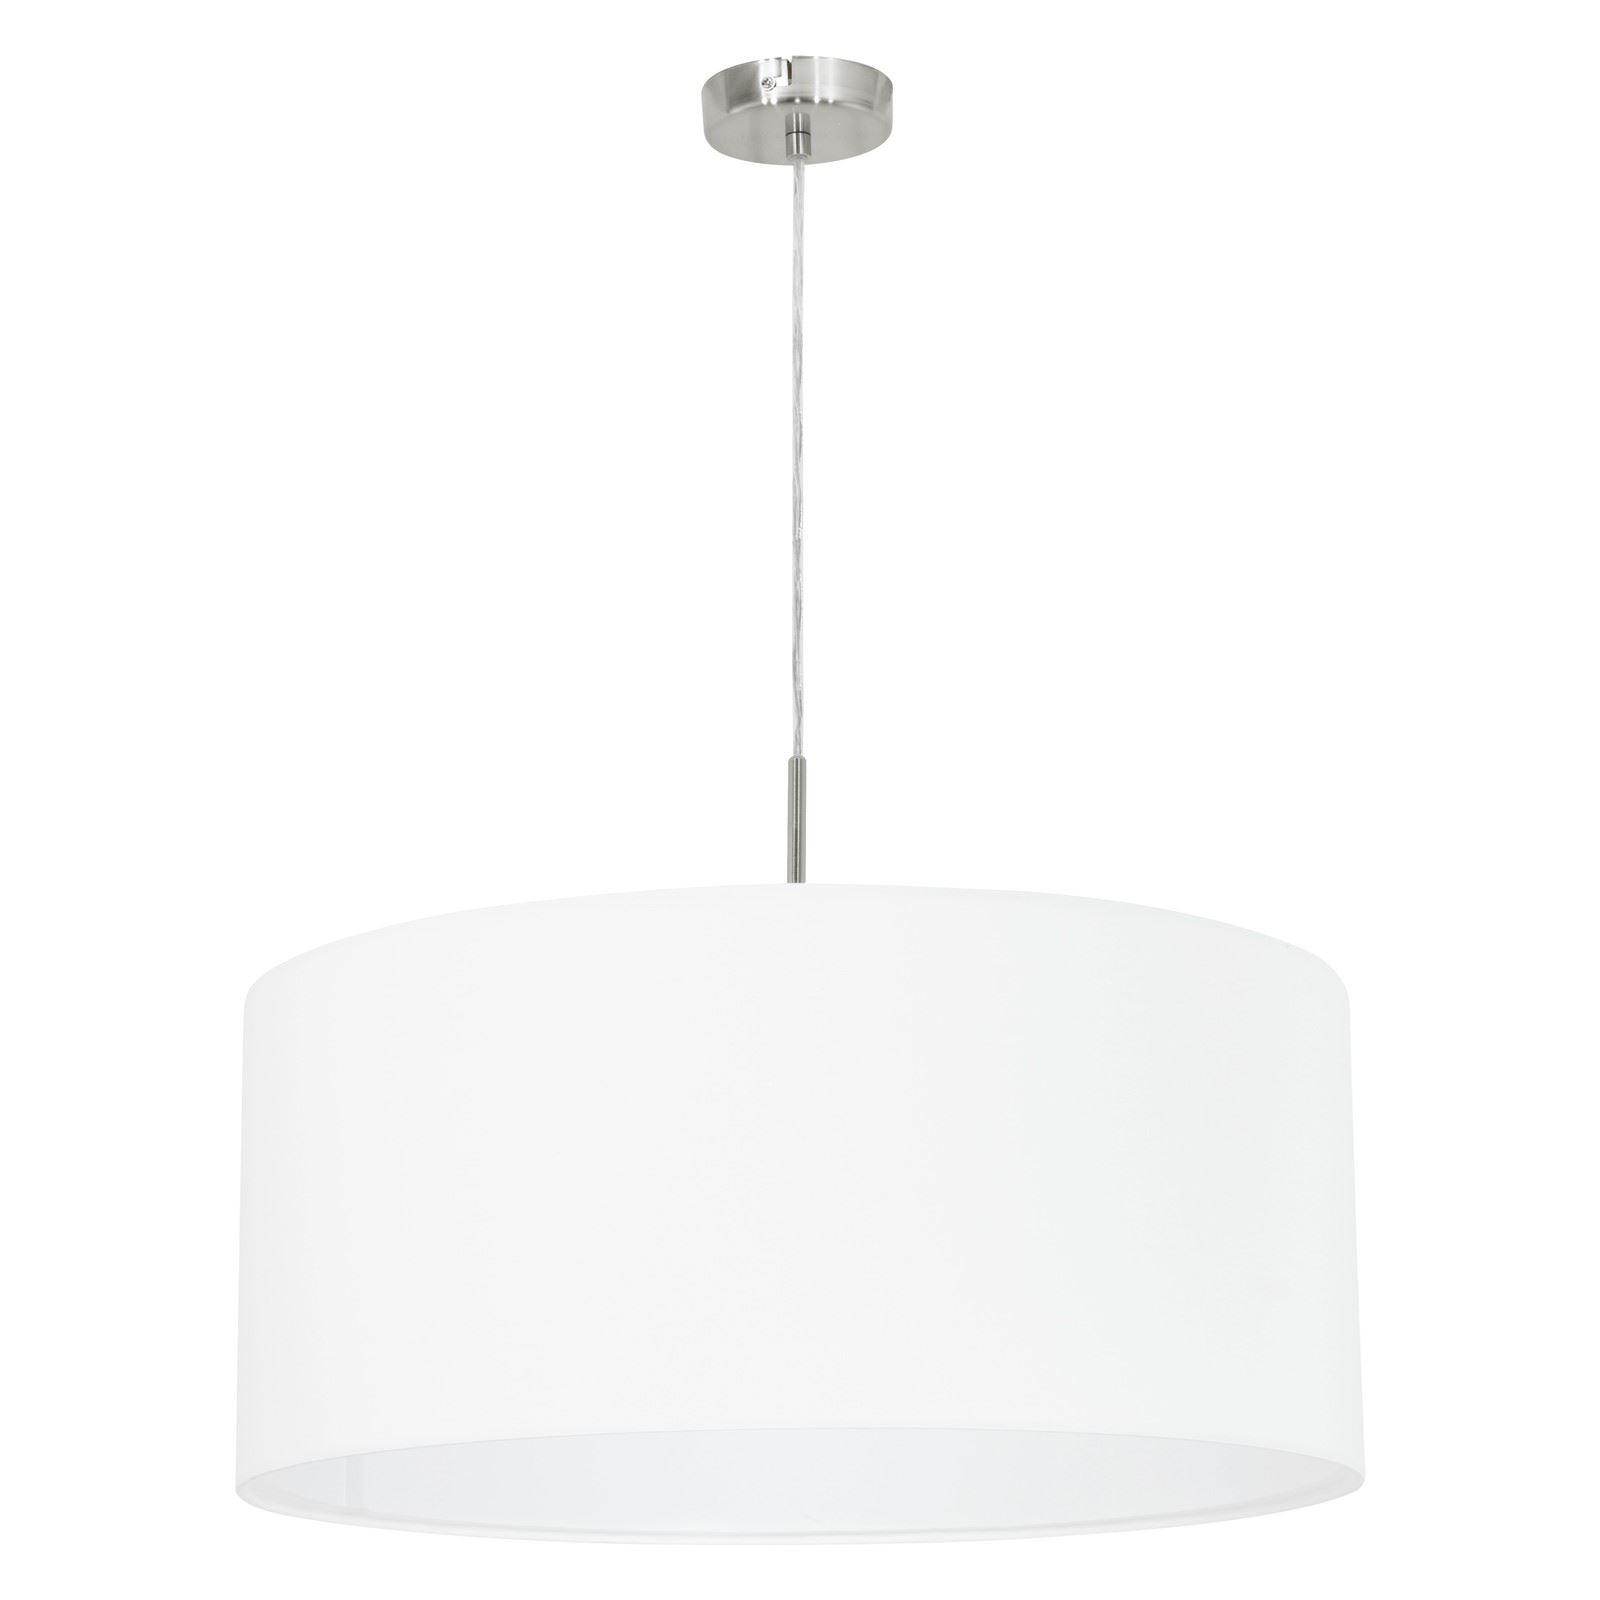 Pasteri Hanging Pendant Light Pendant Lamp Fabric Matt White Shade